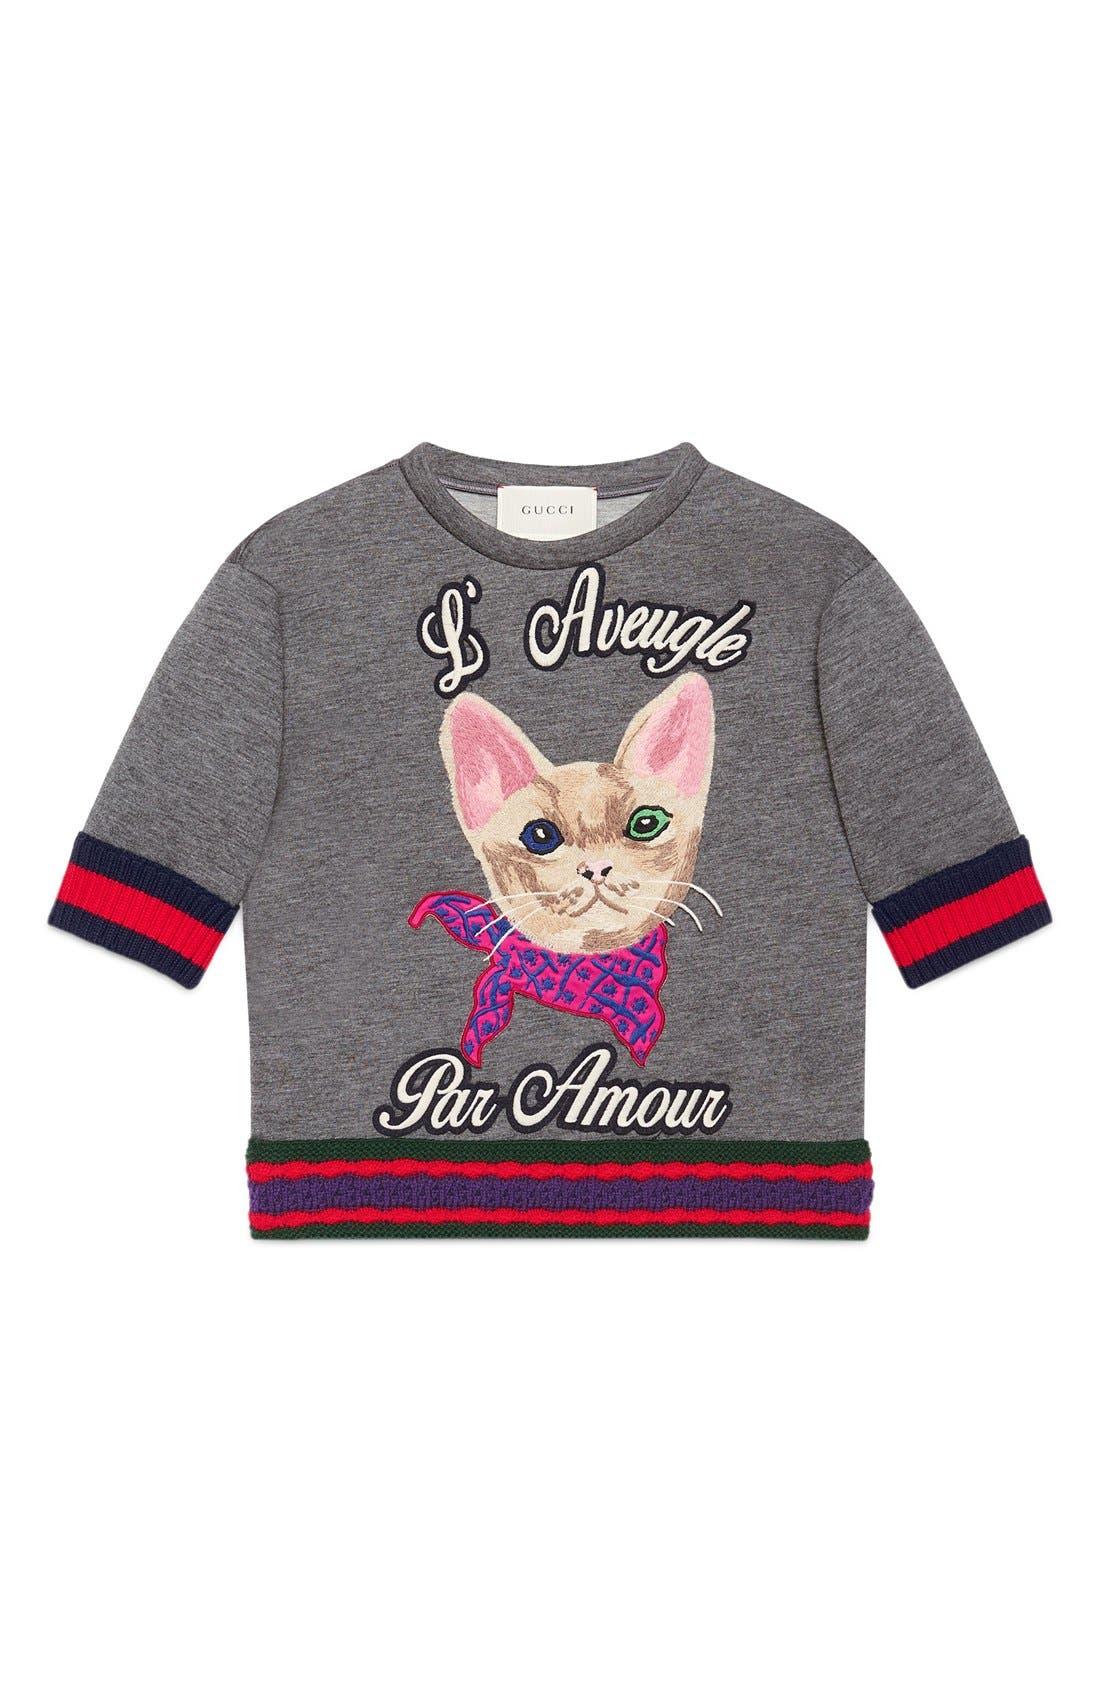 Gucci 'L'Aveugle Par Amour' Kitten Appliqué Sweatshirt (Little Girls & Big Girls)